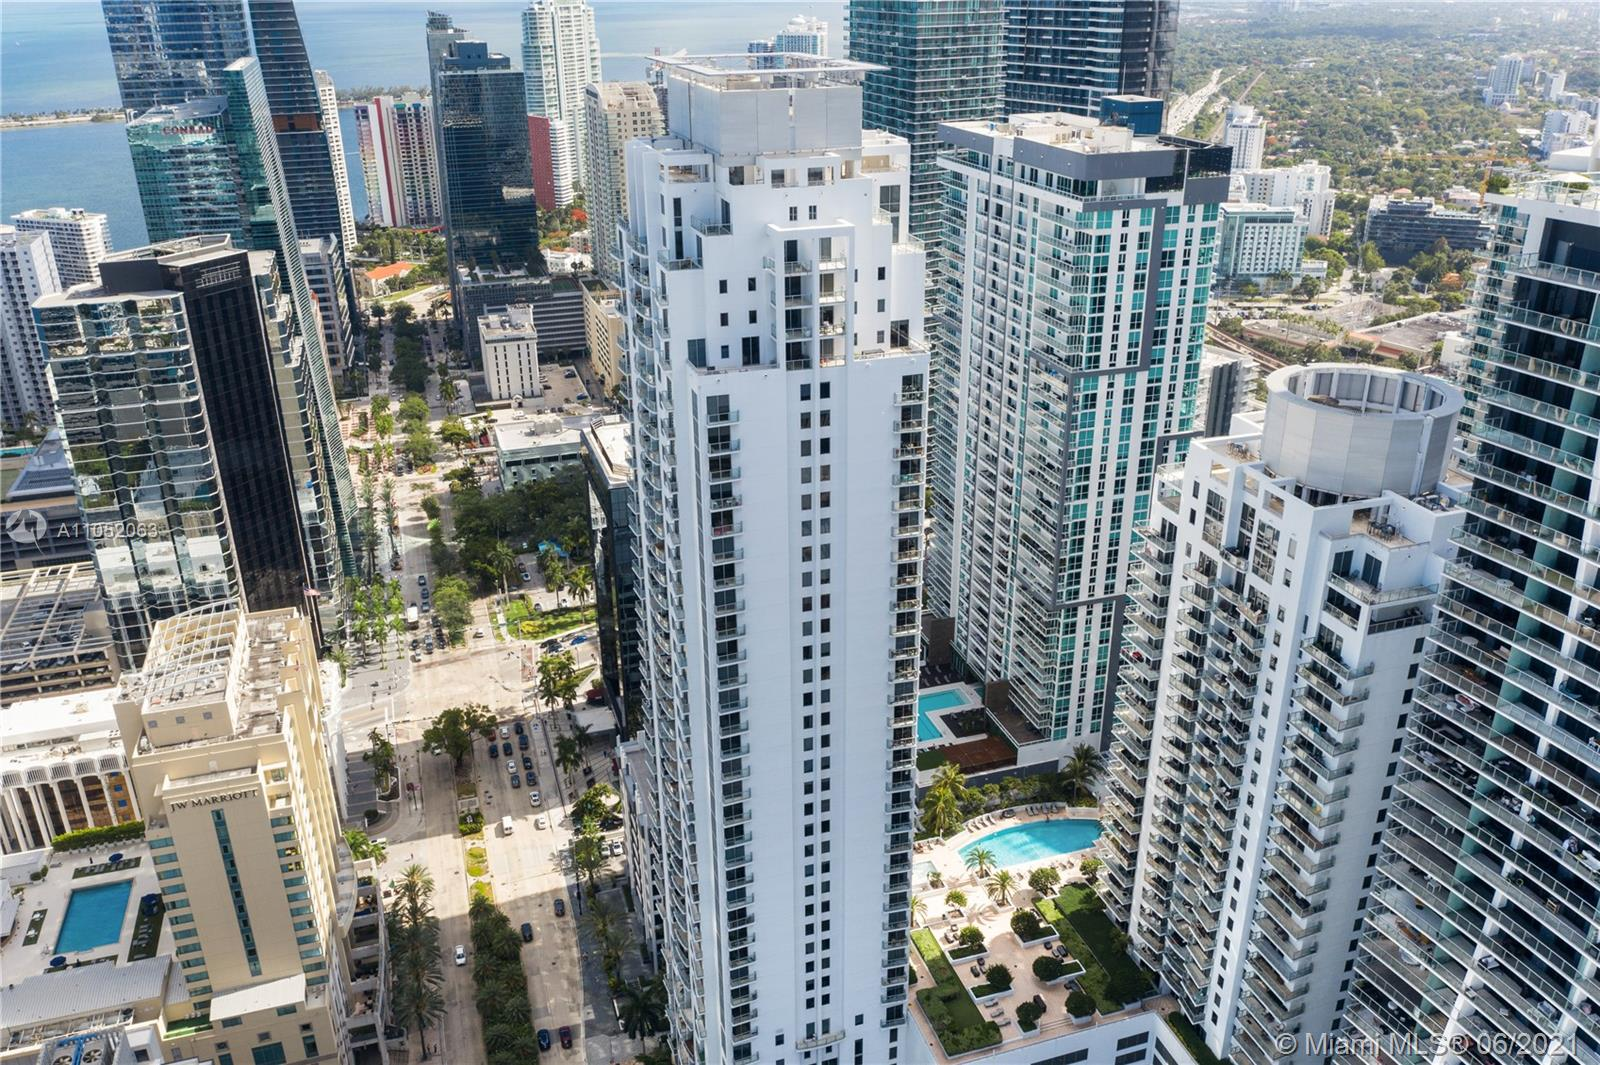 1060 Brickell West Tower #1007 - 1060 Brickell Ave #1007, Miami, FL 33131